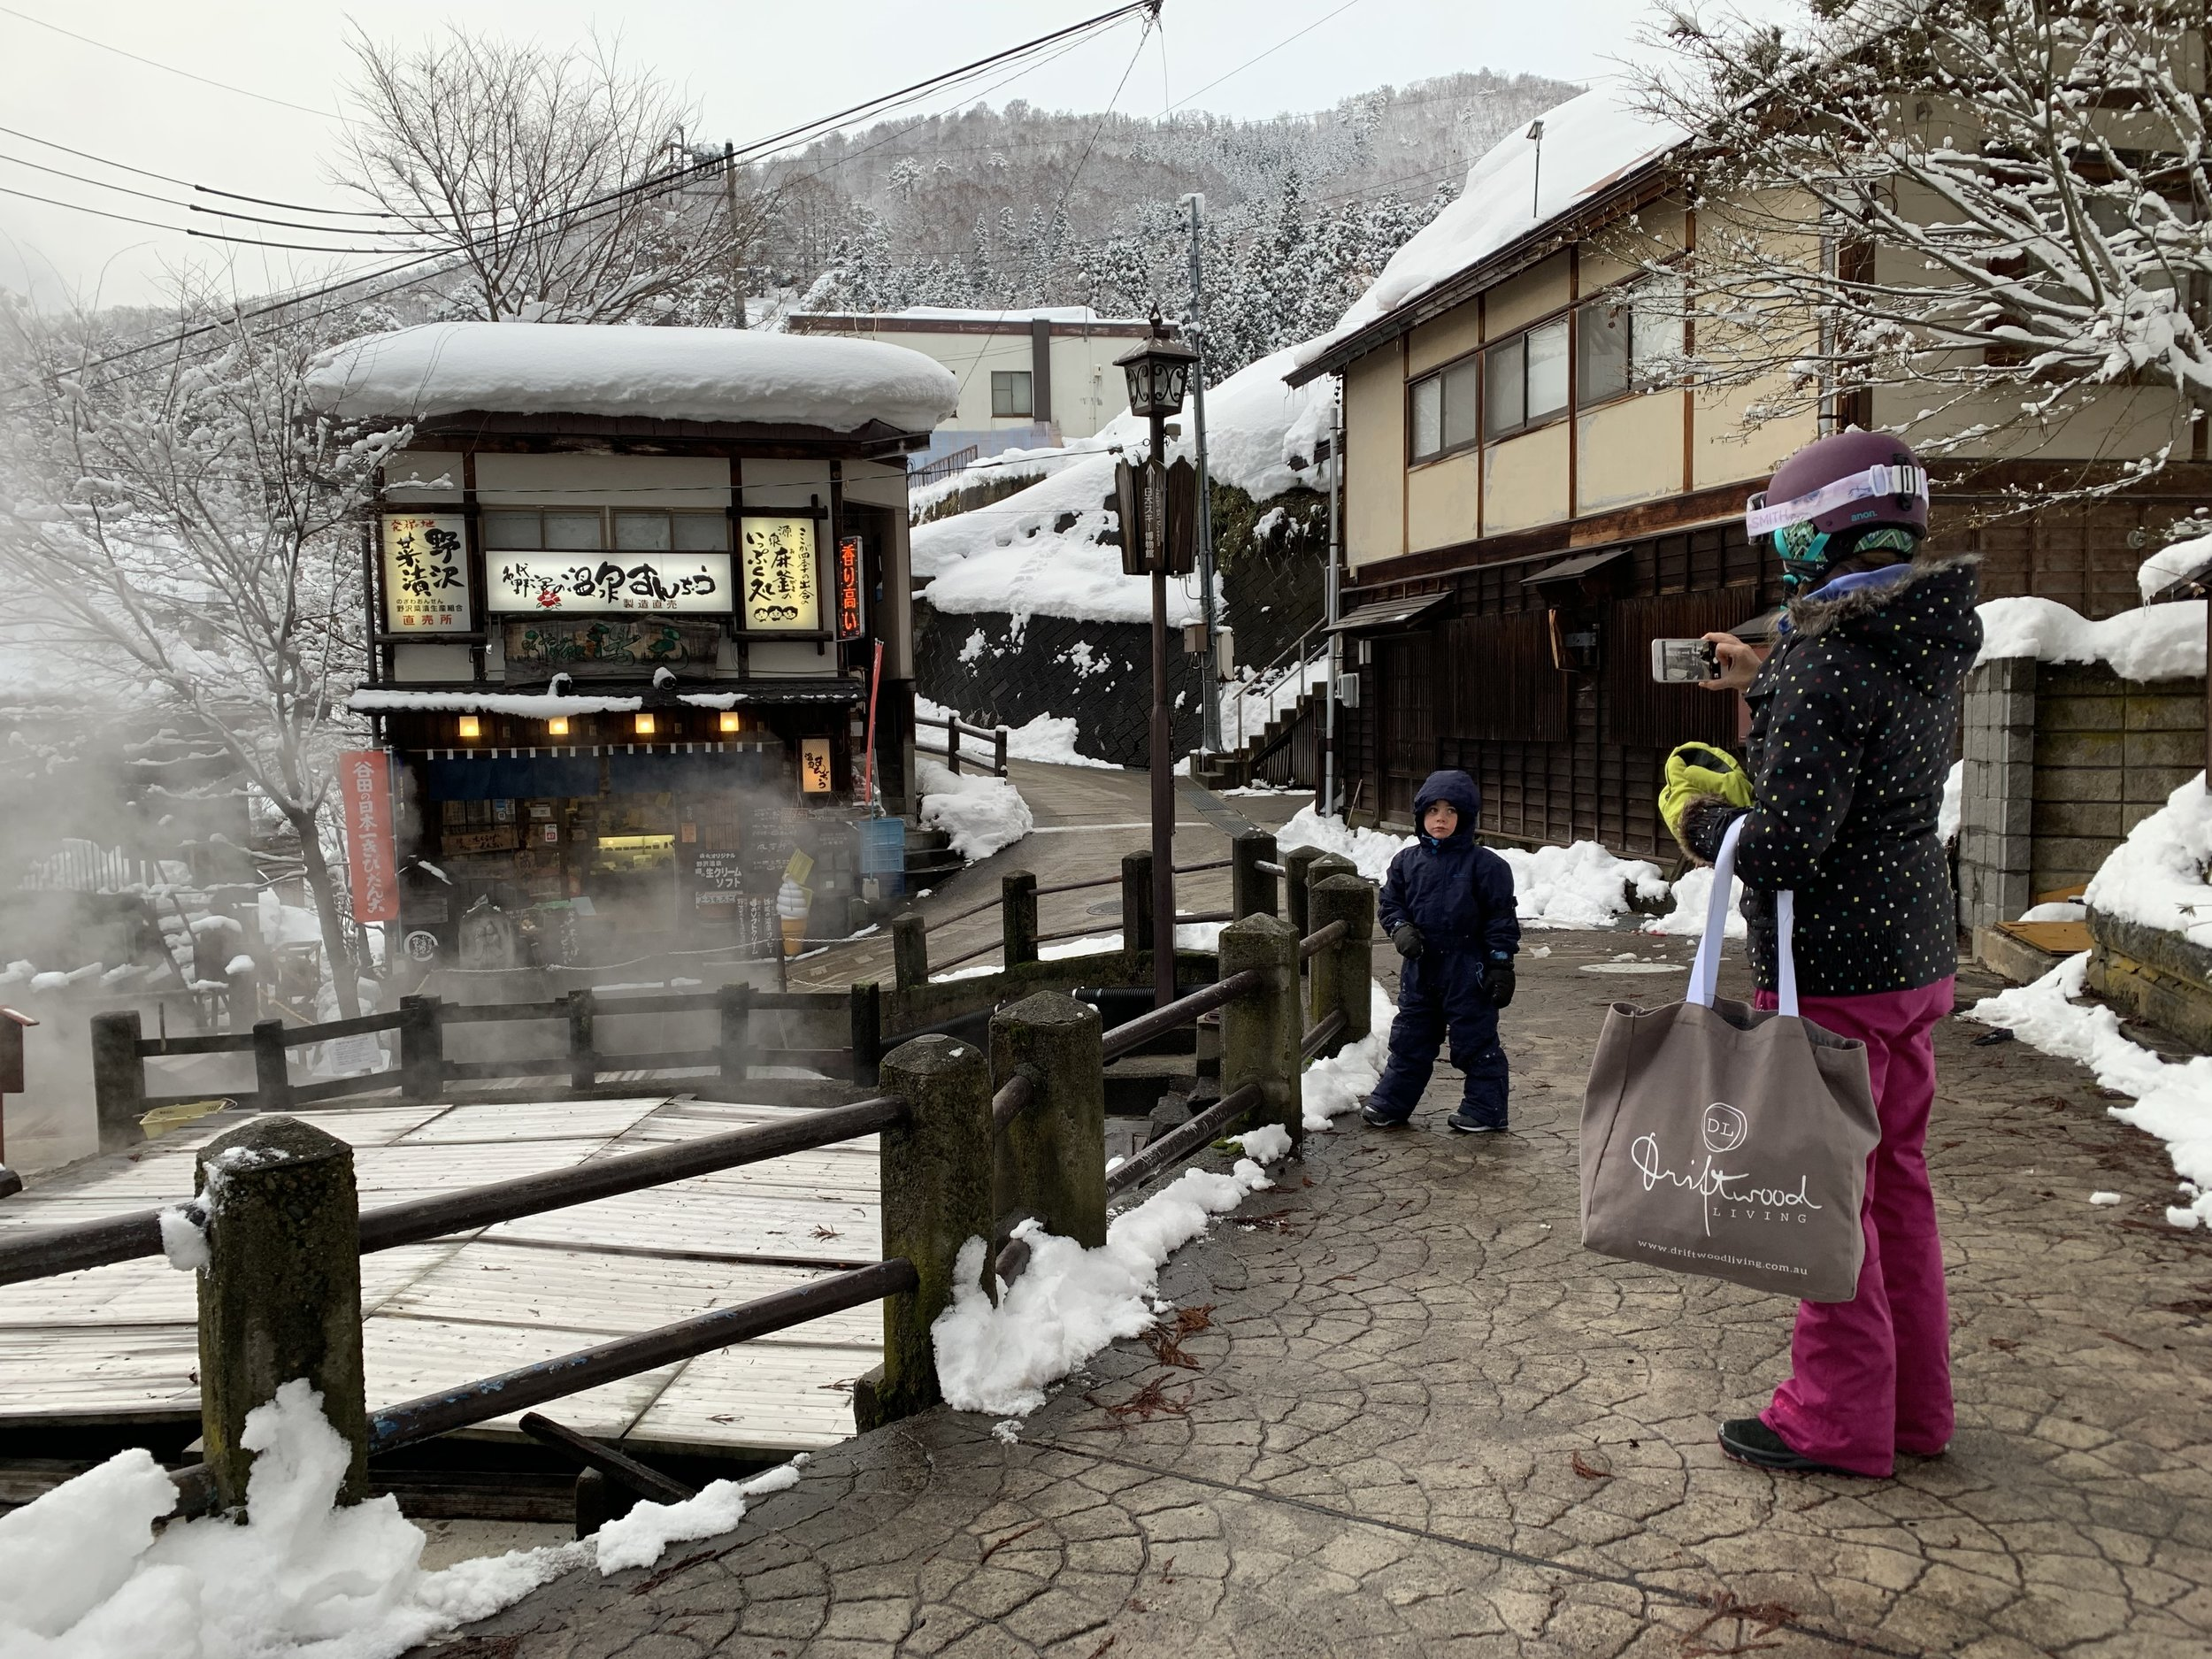 Family Winter Experiences in Nozawa Onsen